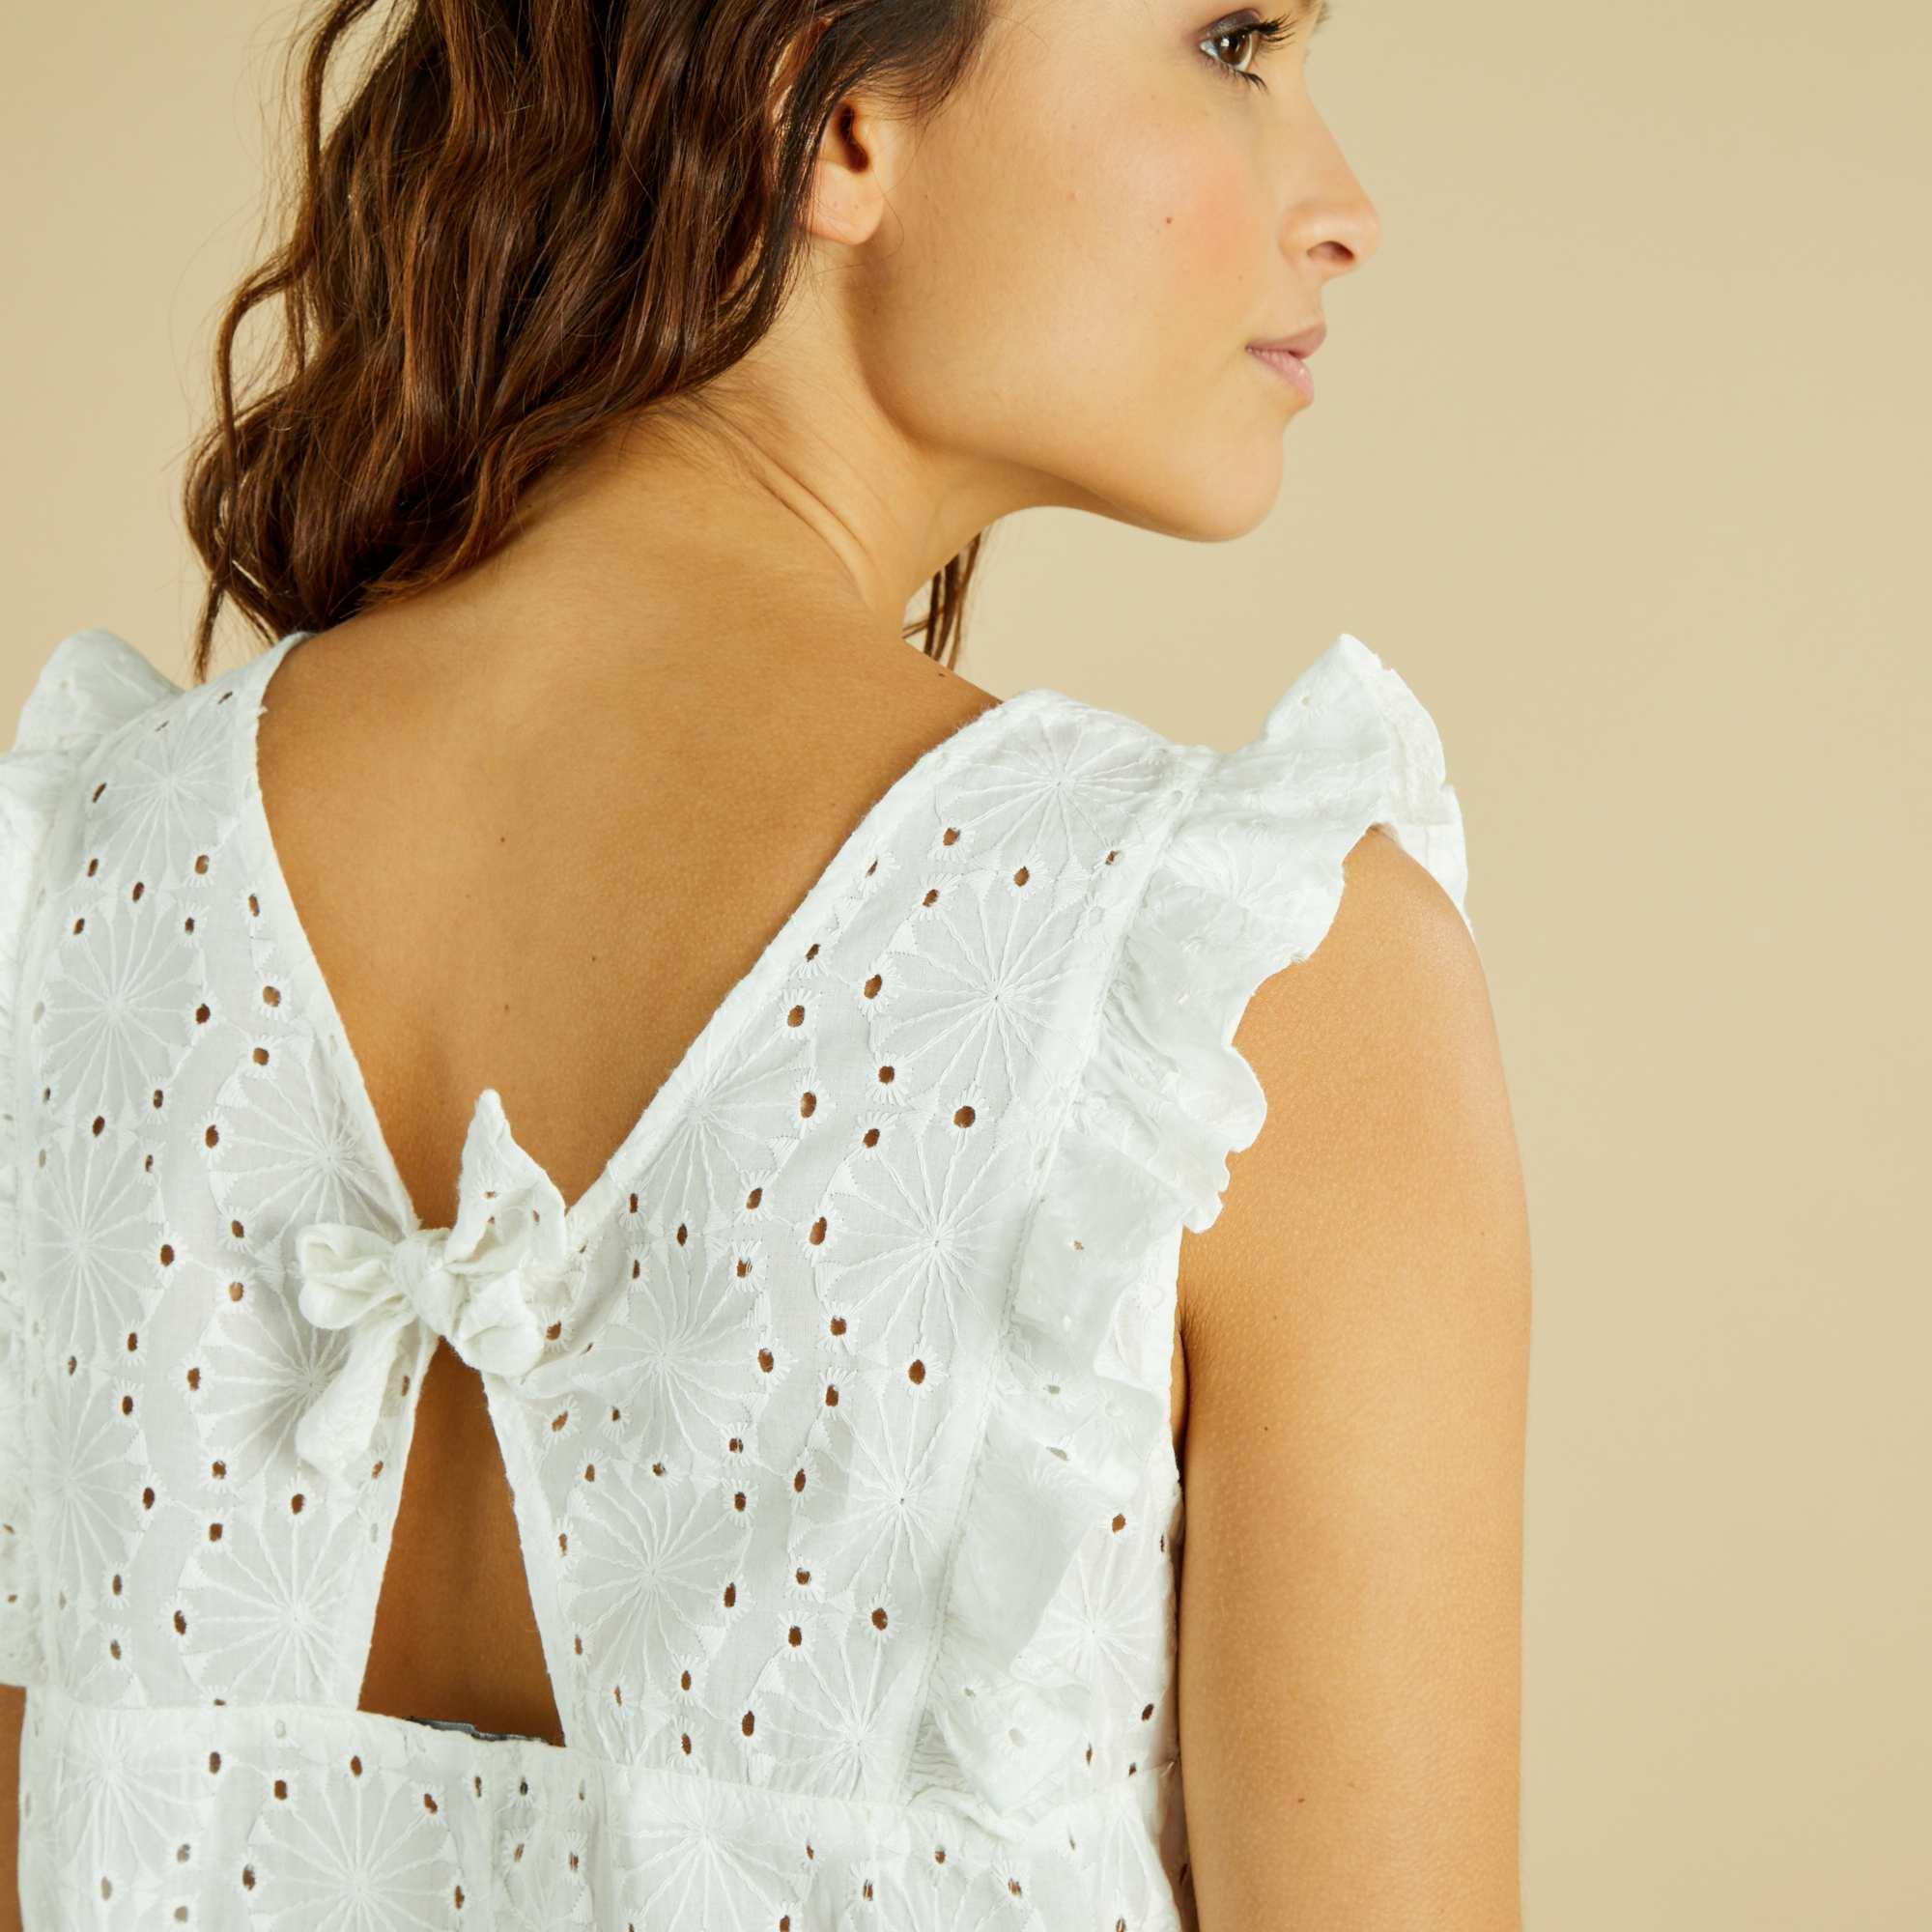 Blusa con bordado ingl s mujer blanco nieve kiabi 15 00 for Blanco nieve